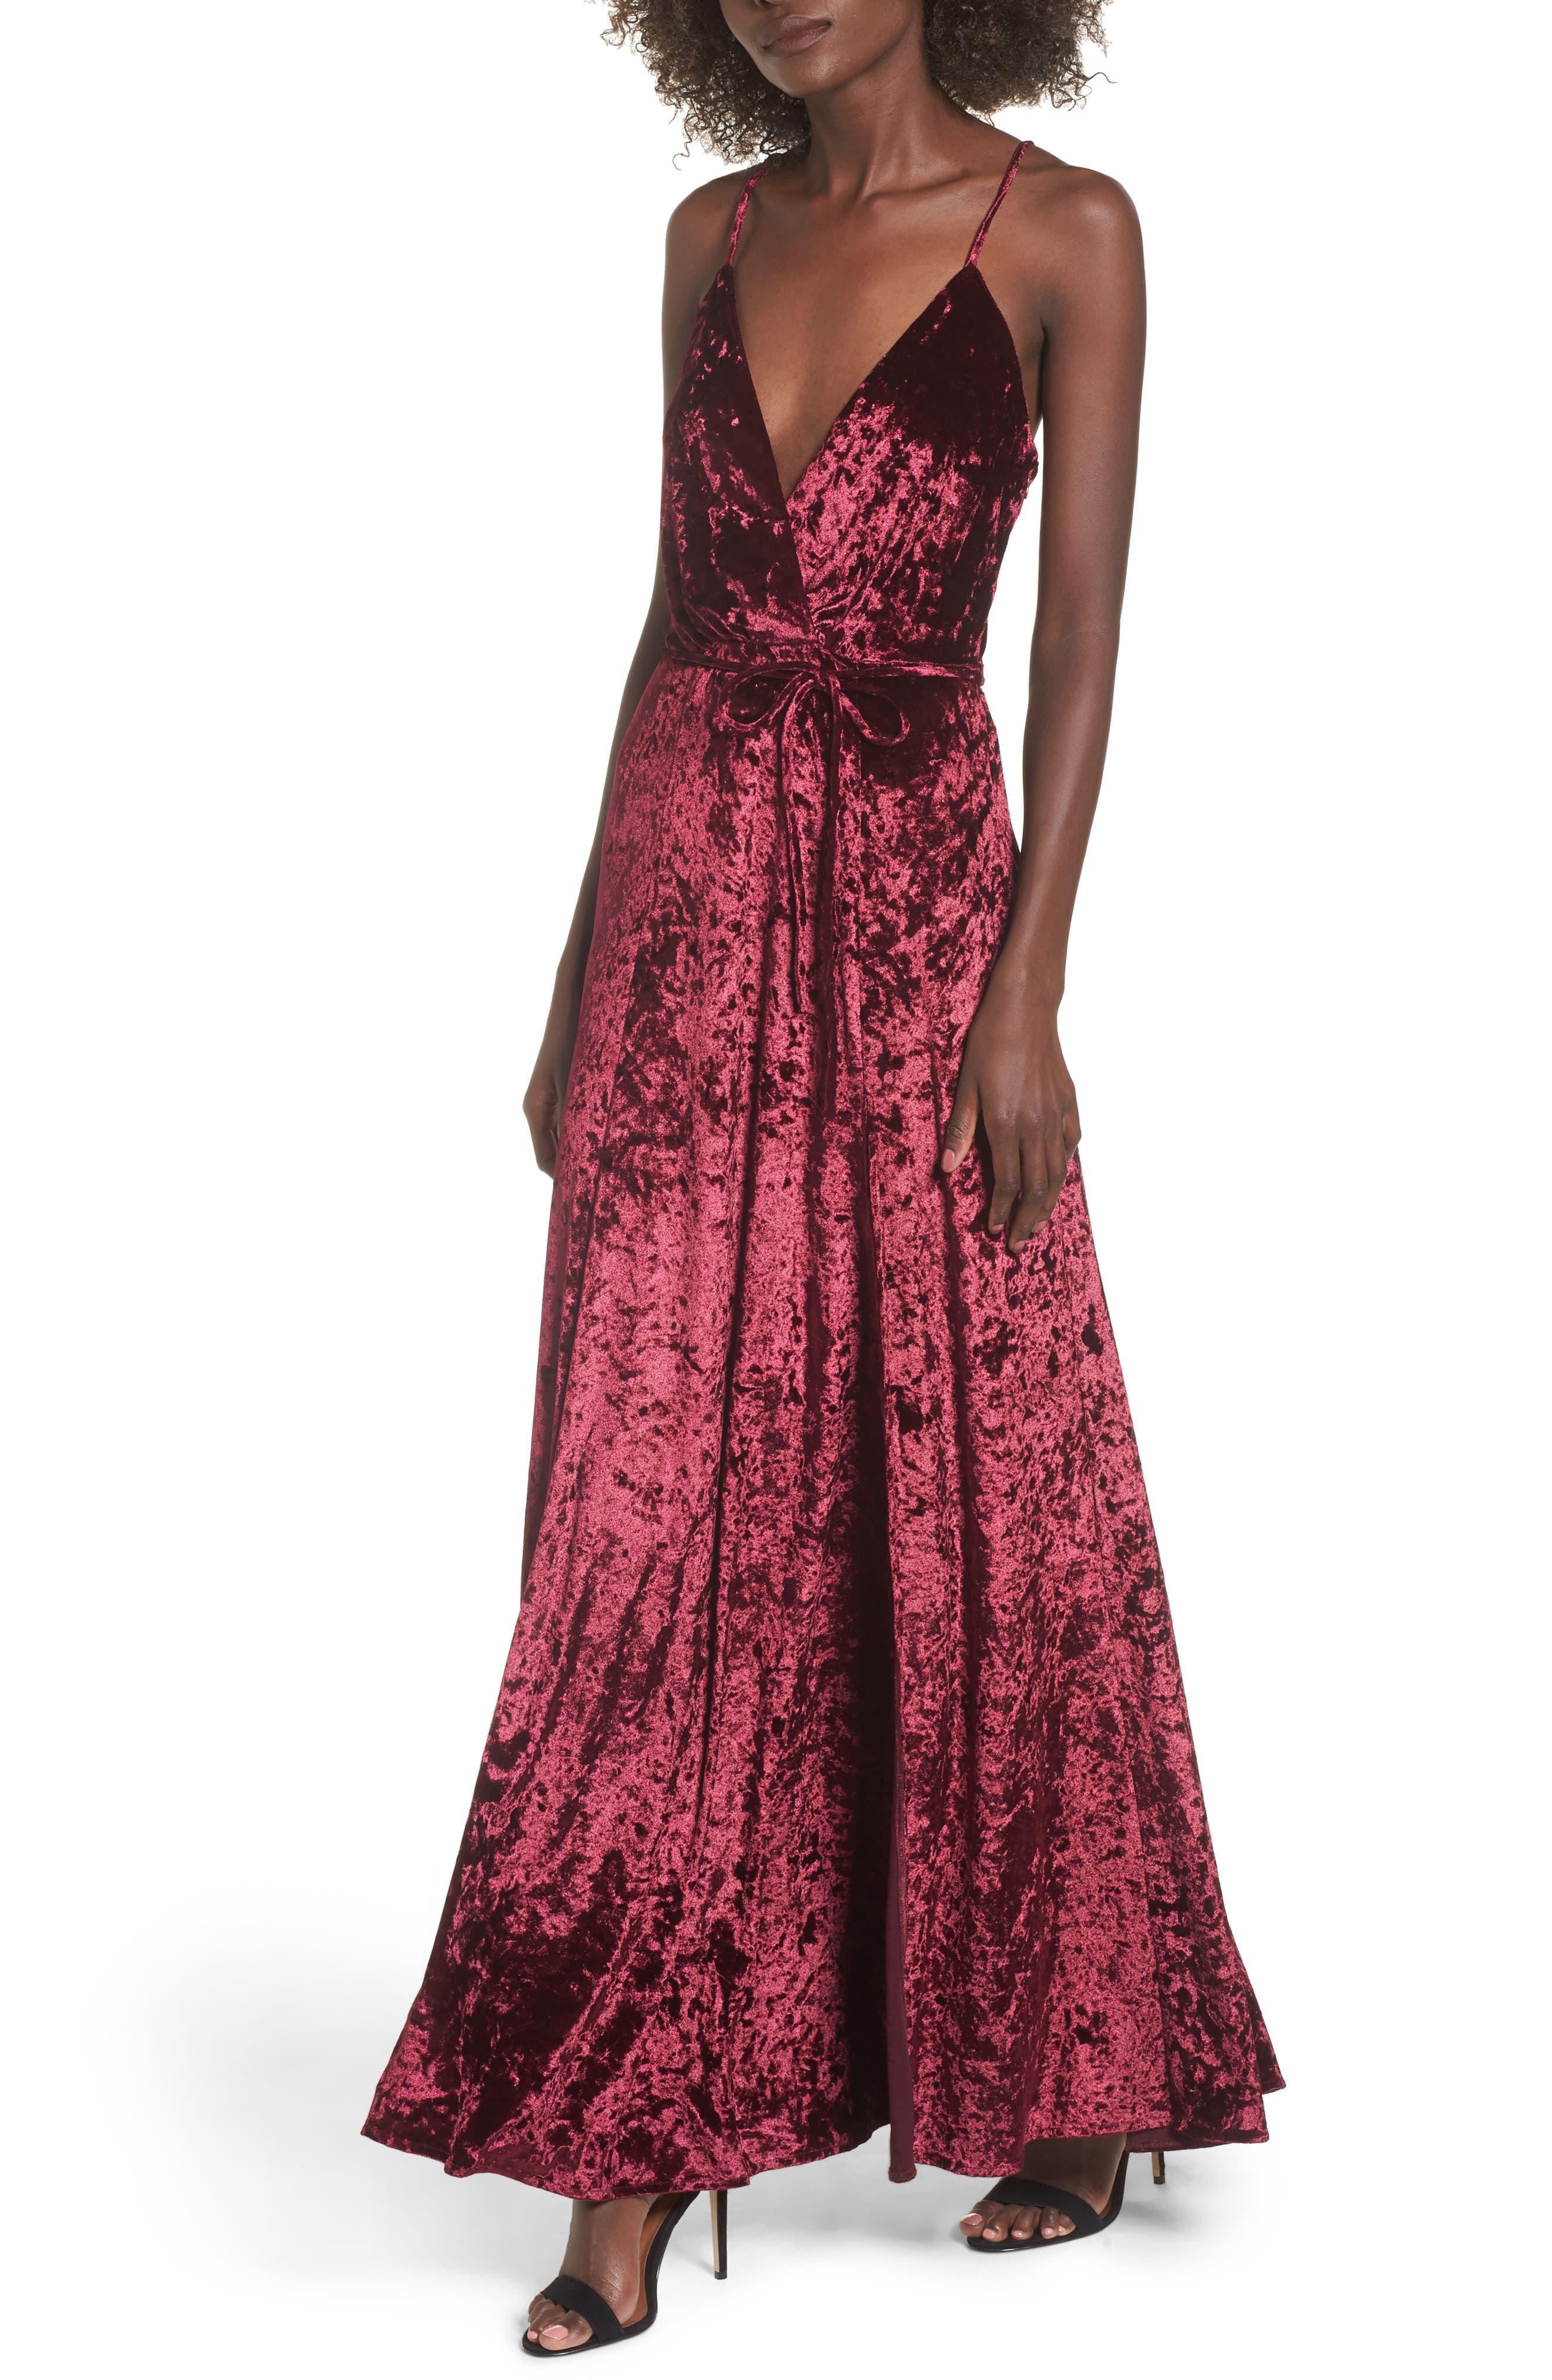 Crenshaw Maxi Dress,                         Main,                         color, Bordeaux